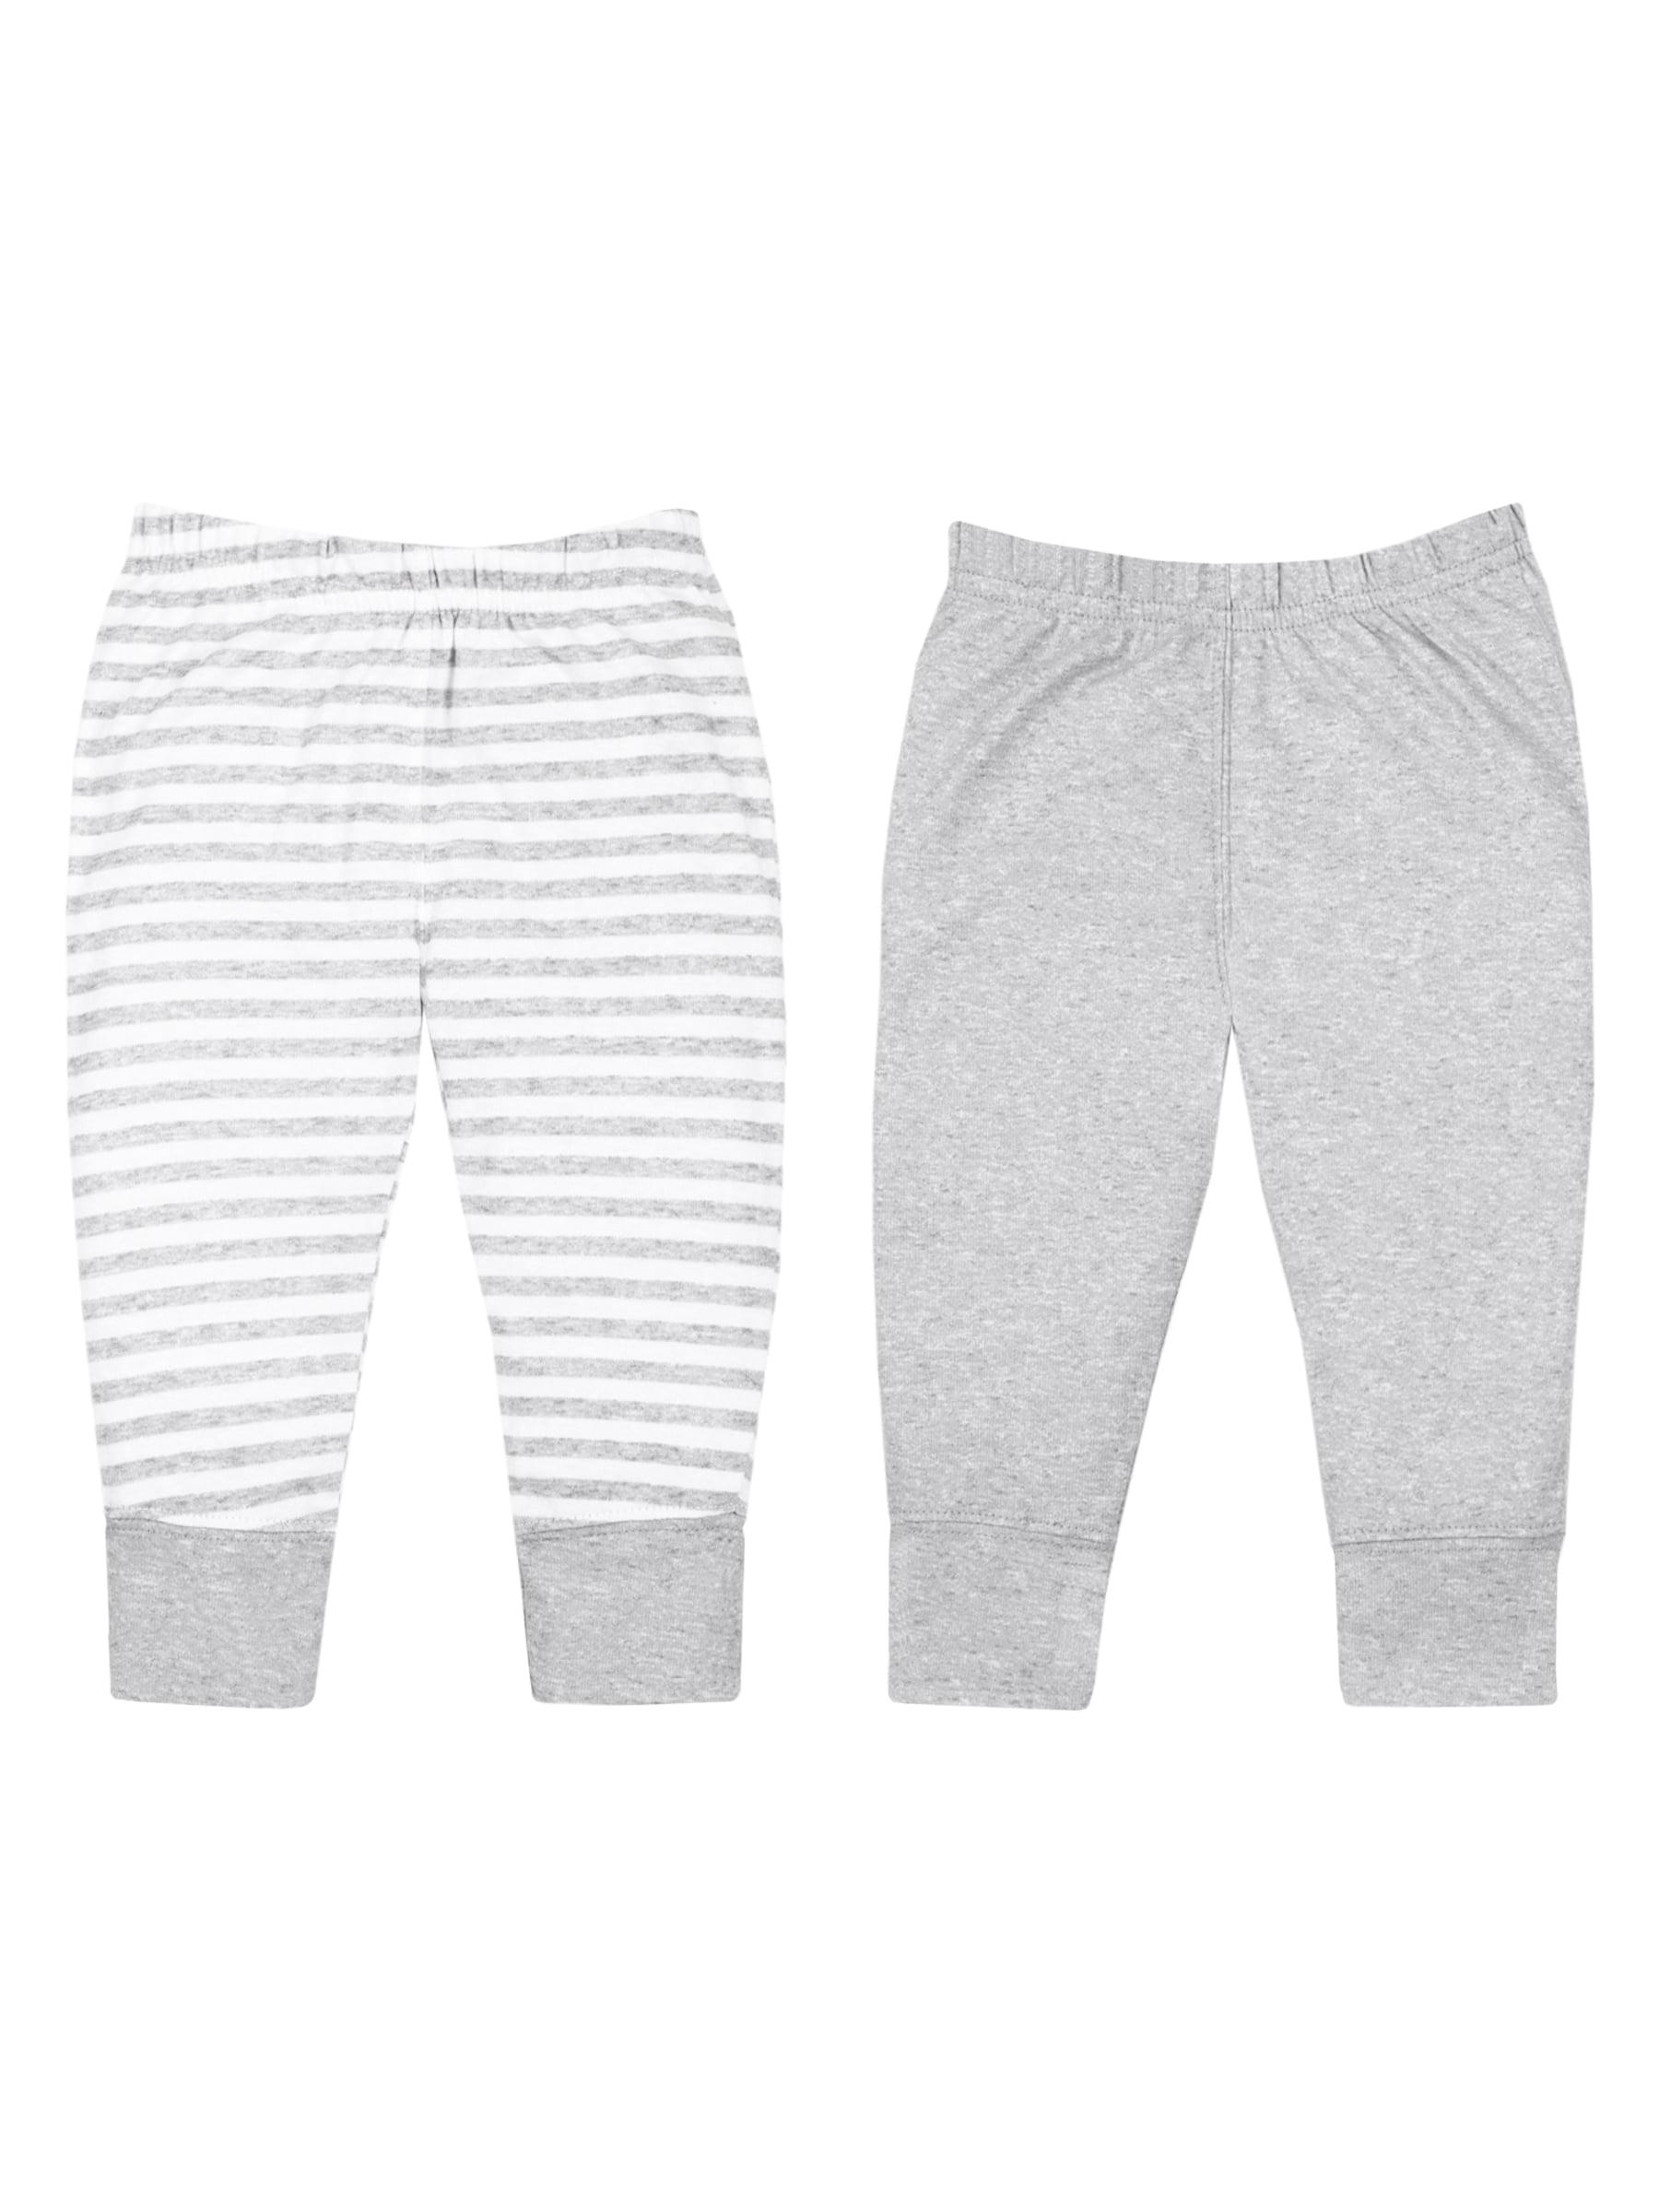 100% Organic Cotton Knit Pants, 2-pack (Baby Boys)